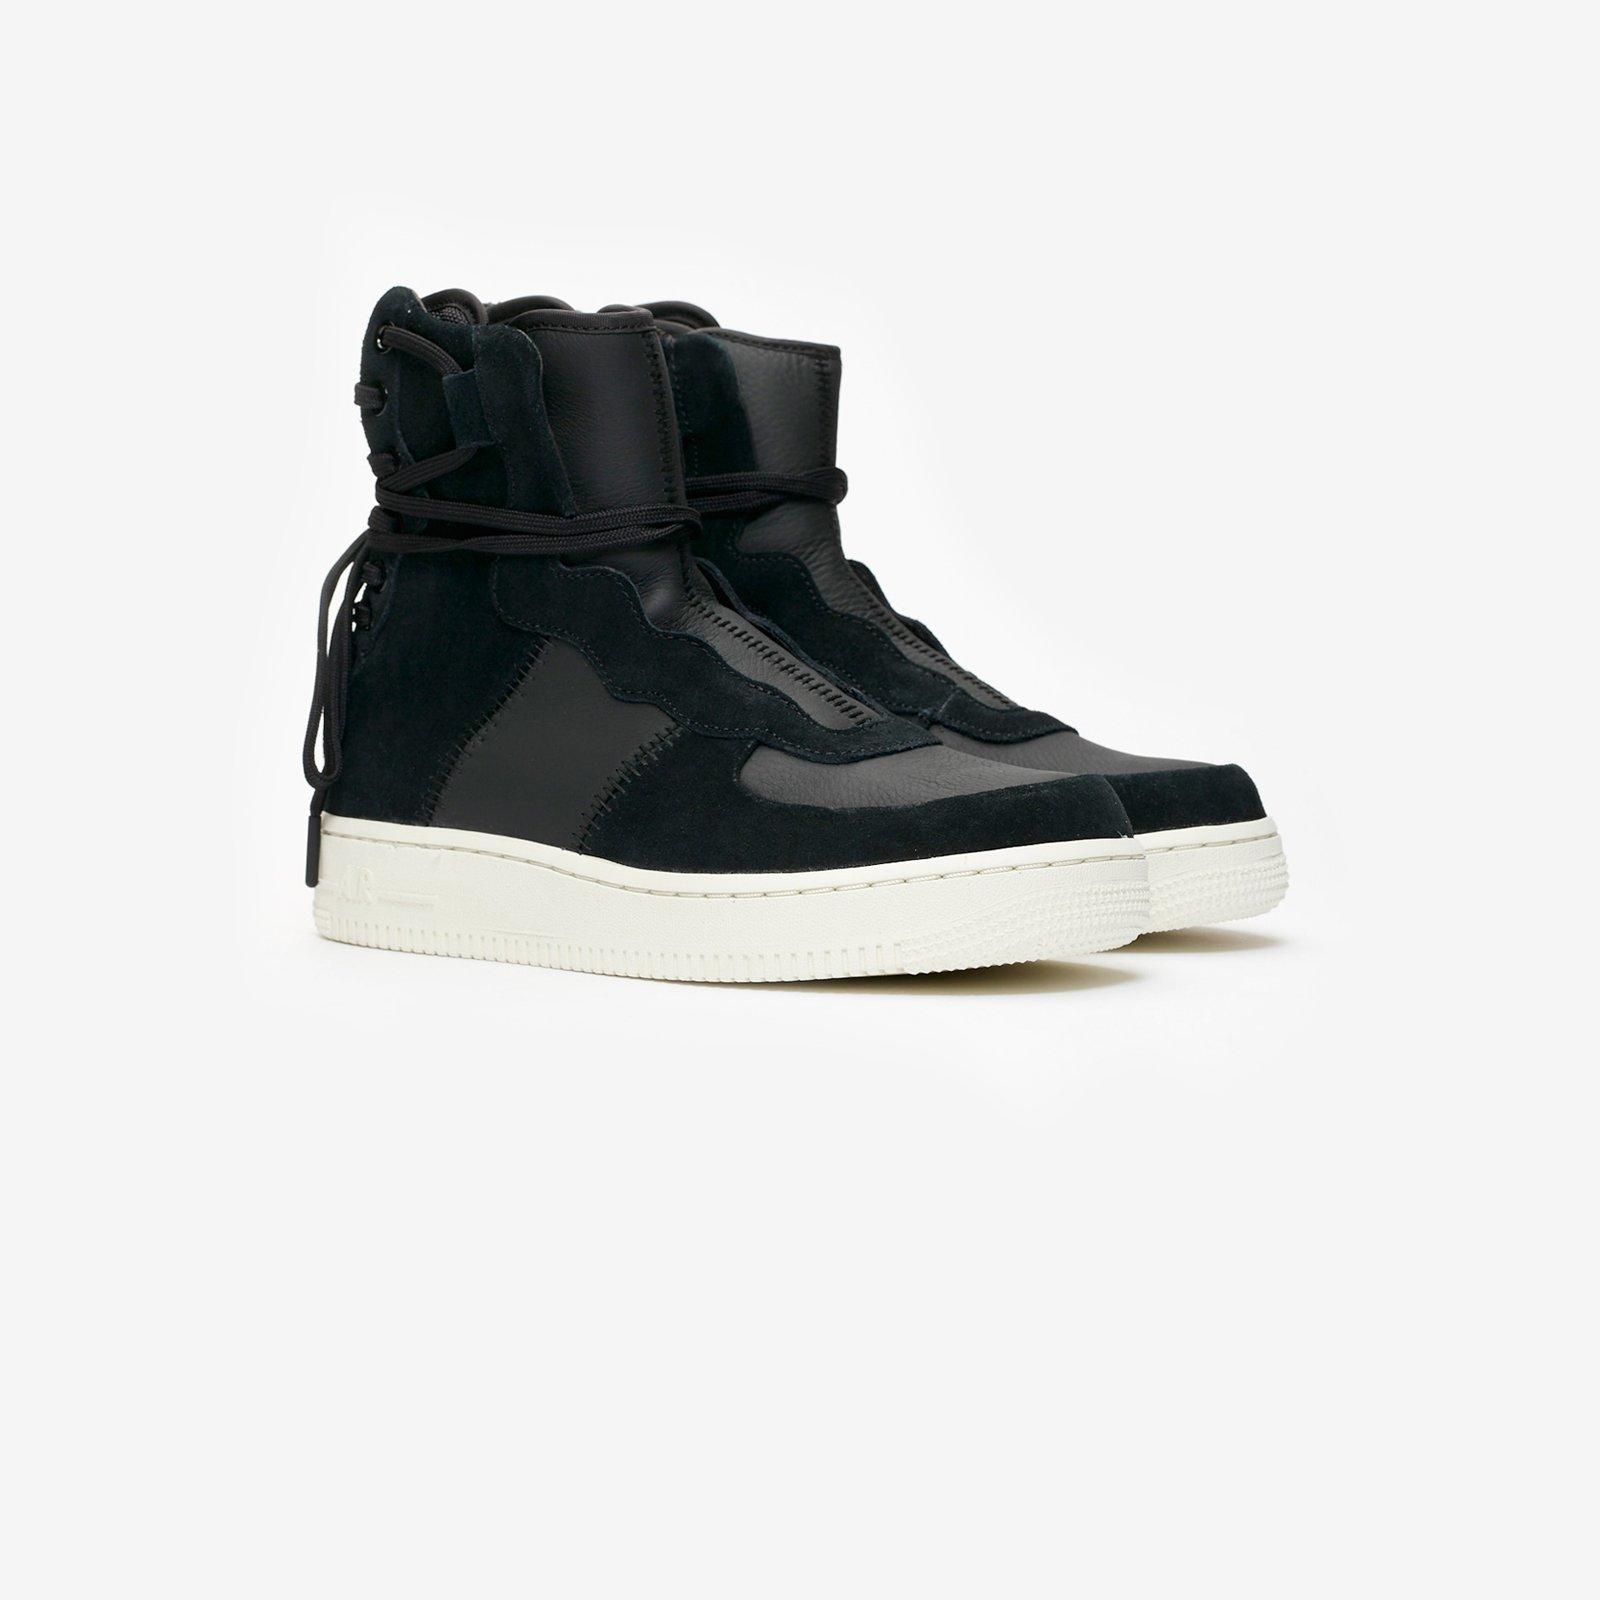 super popular c00a2 6f5a6 Nike Wmns AF1 Rebel XX Premium - Bv8252-001 - Sneakersnstuff ...